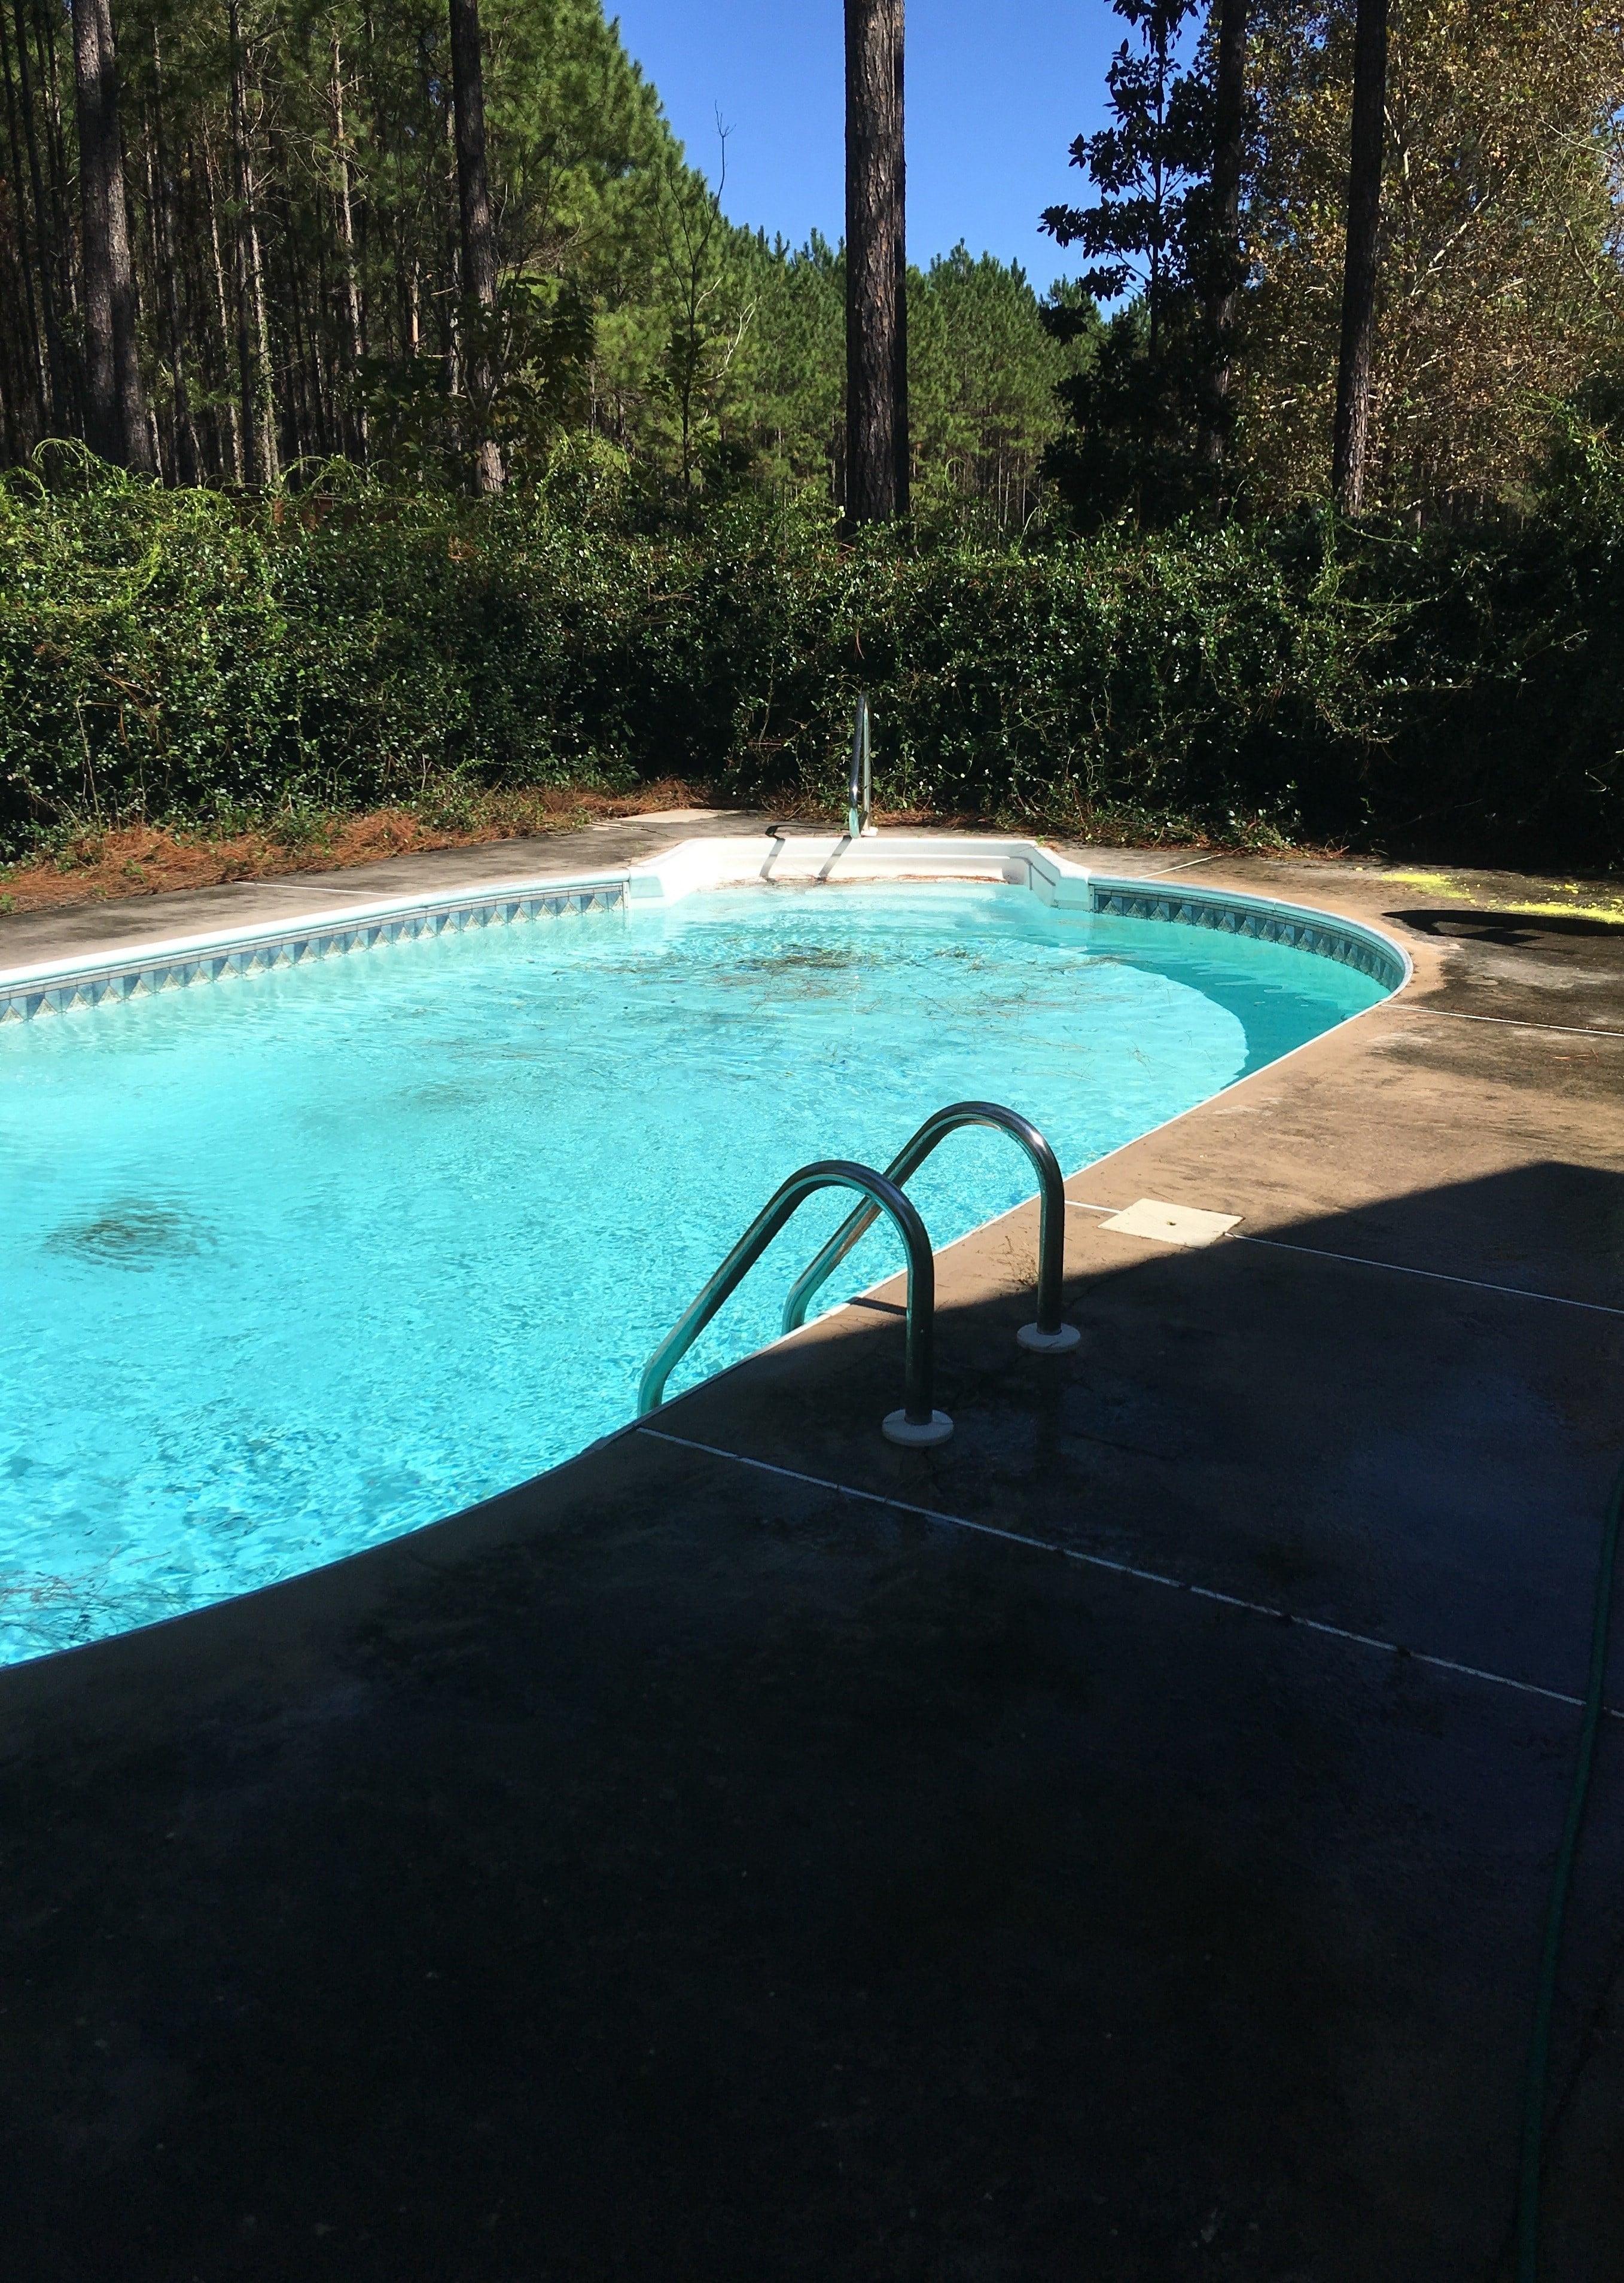 Pool Concrete Paint Before